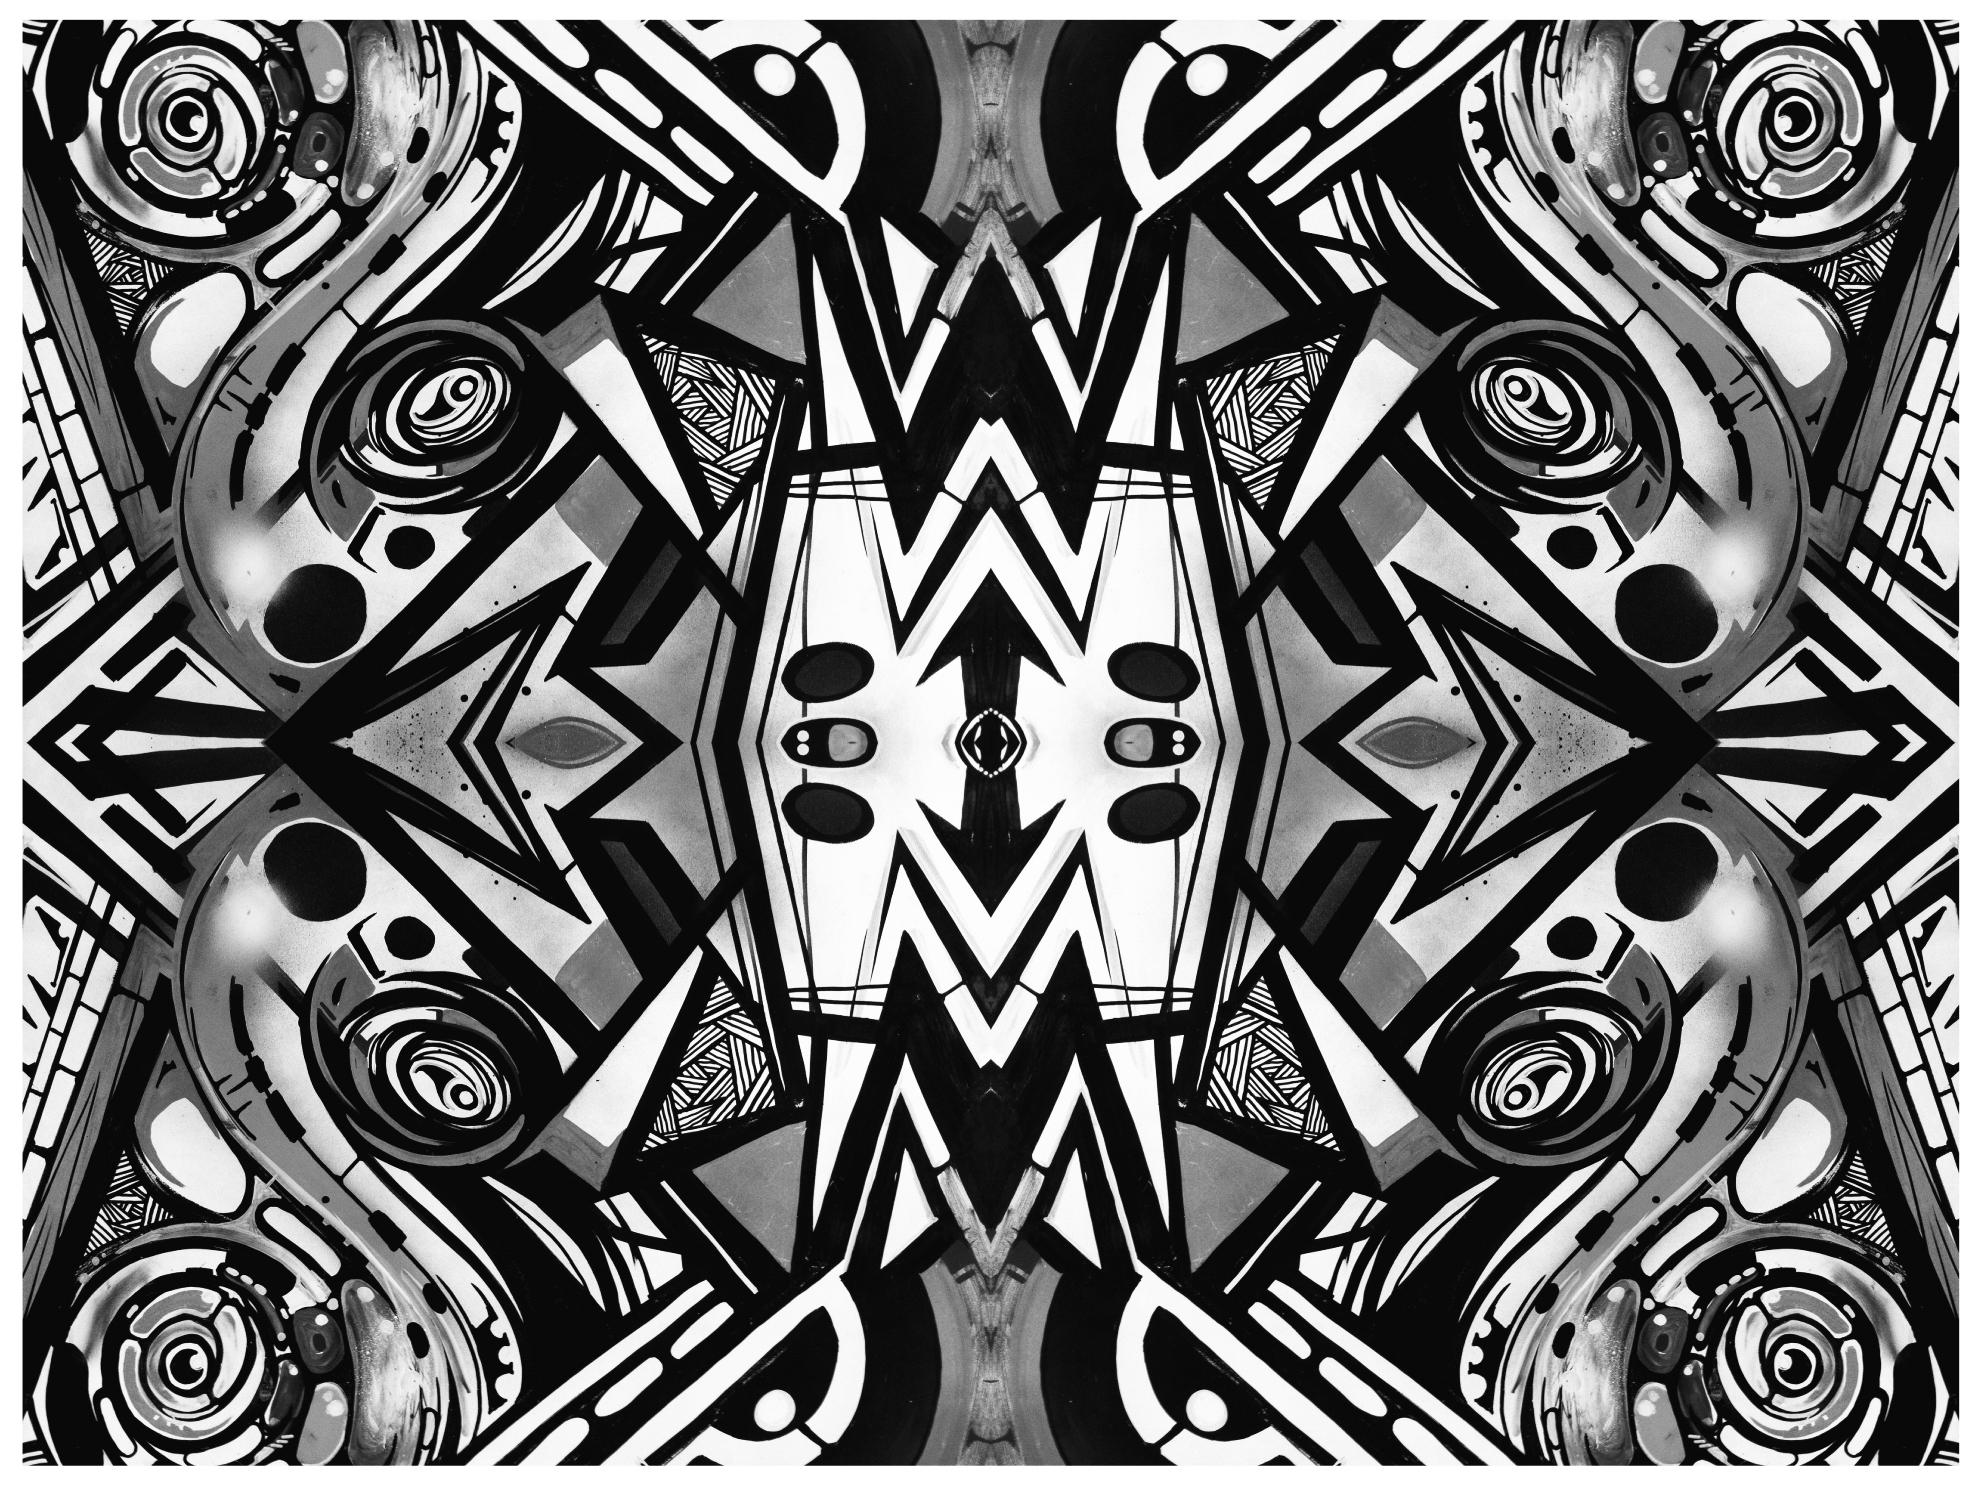 Symetric